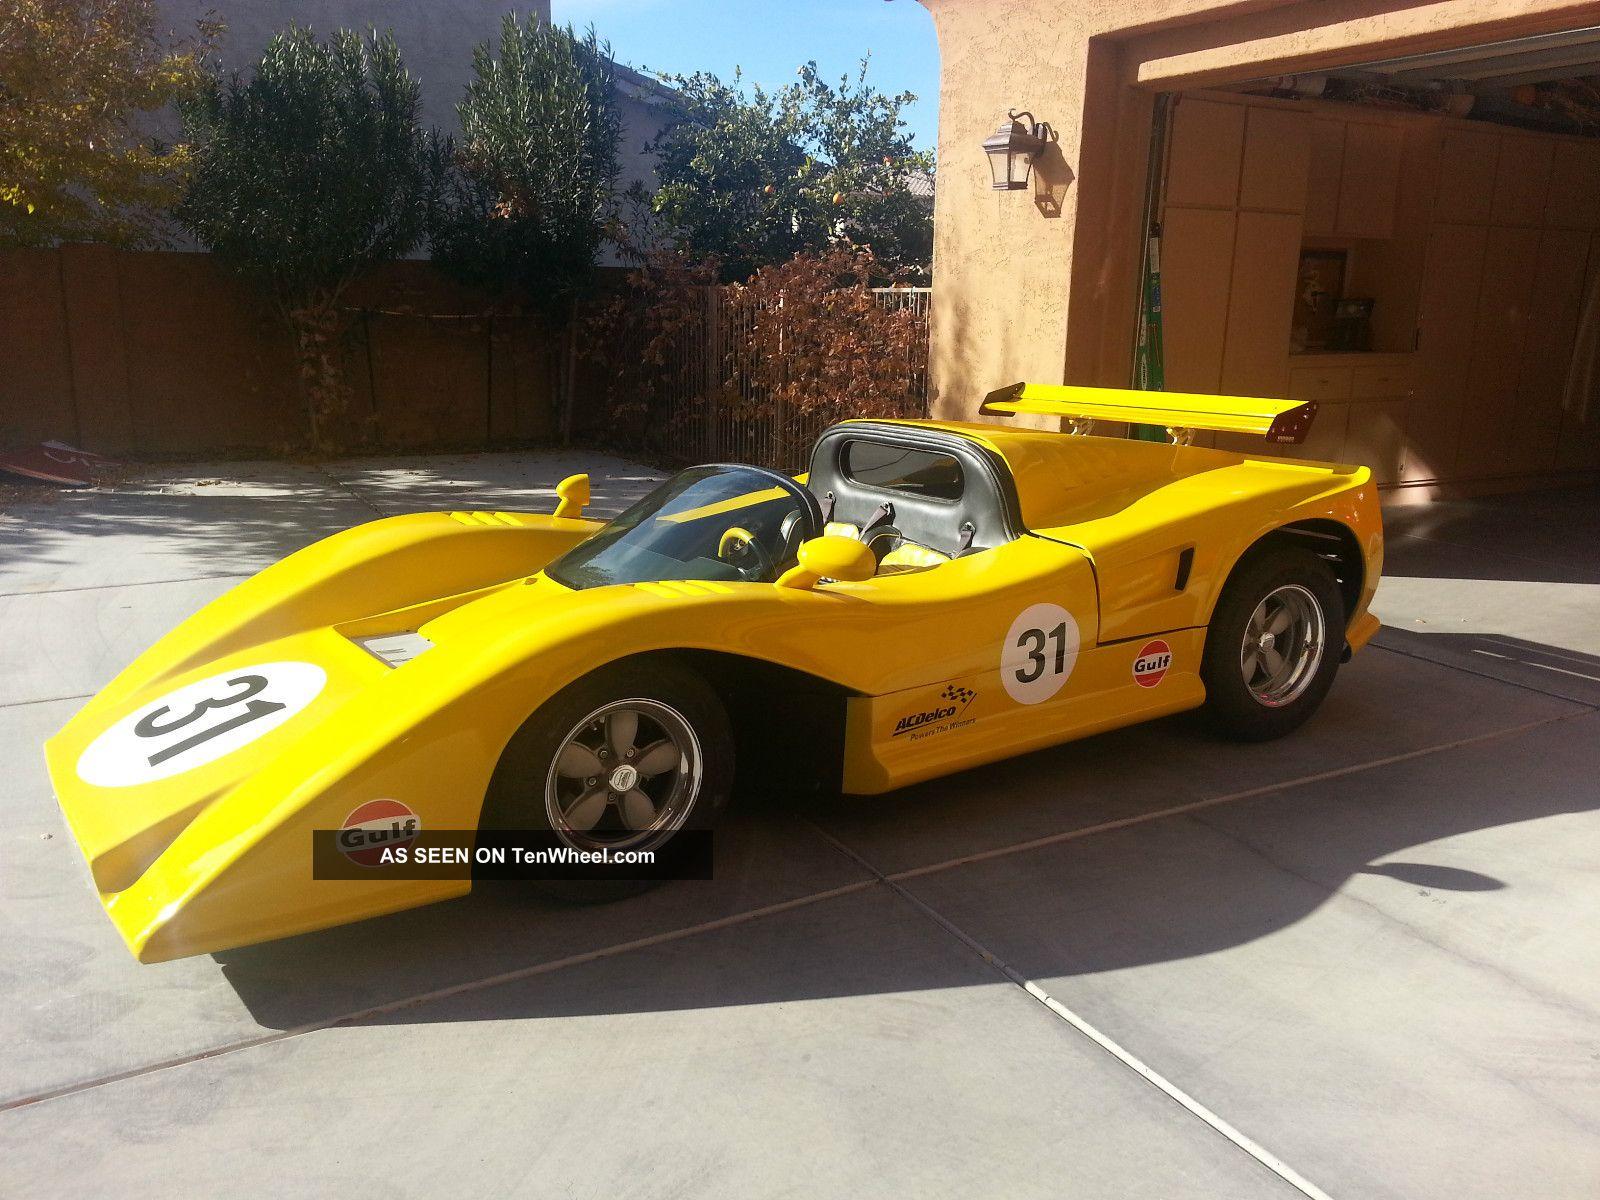 1969 Manta Mirage Mclaren M8b Replica Of 1969 Can Am Race Car Hot Rod Hotrod